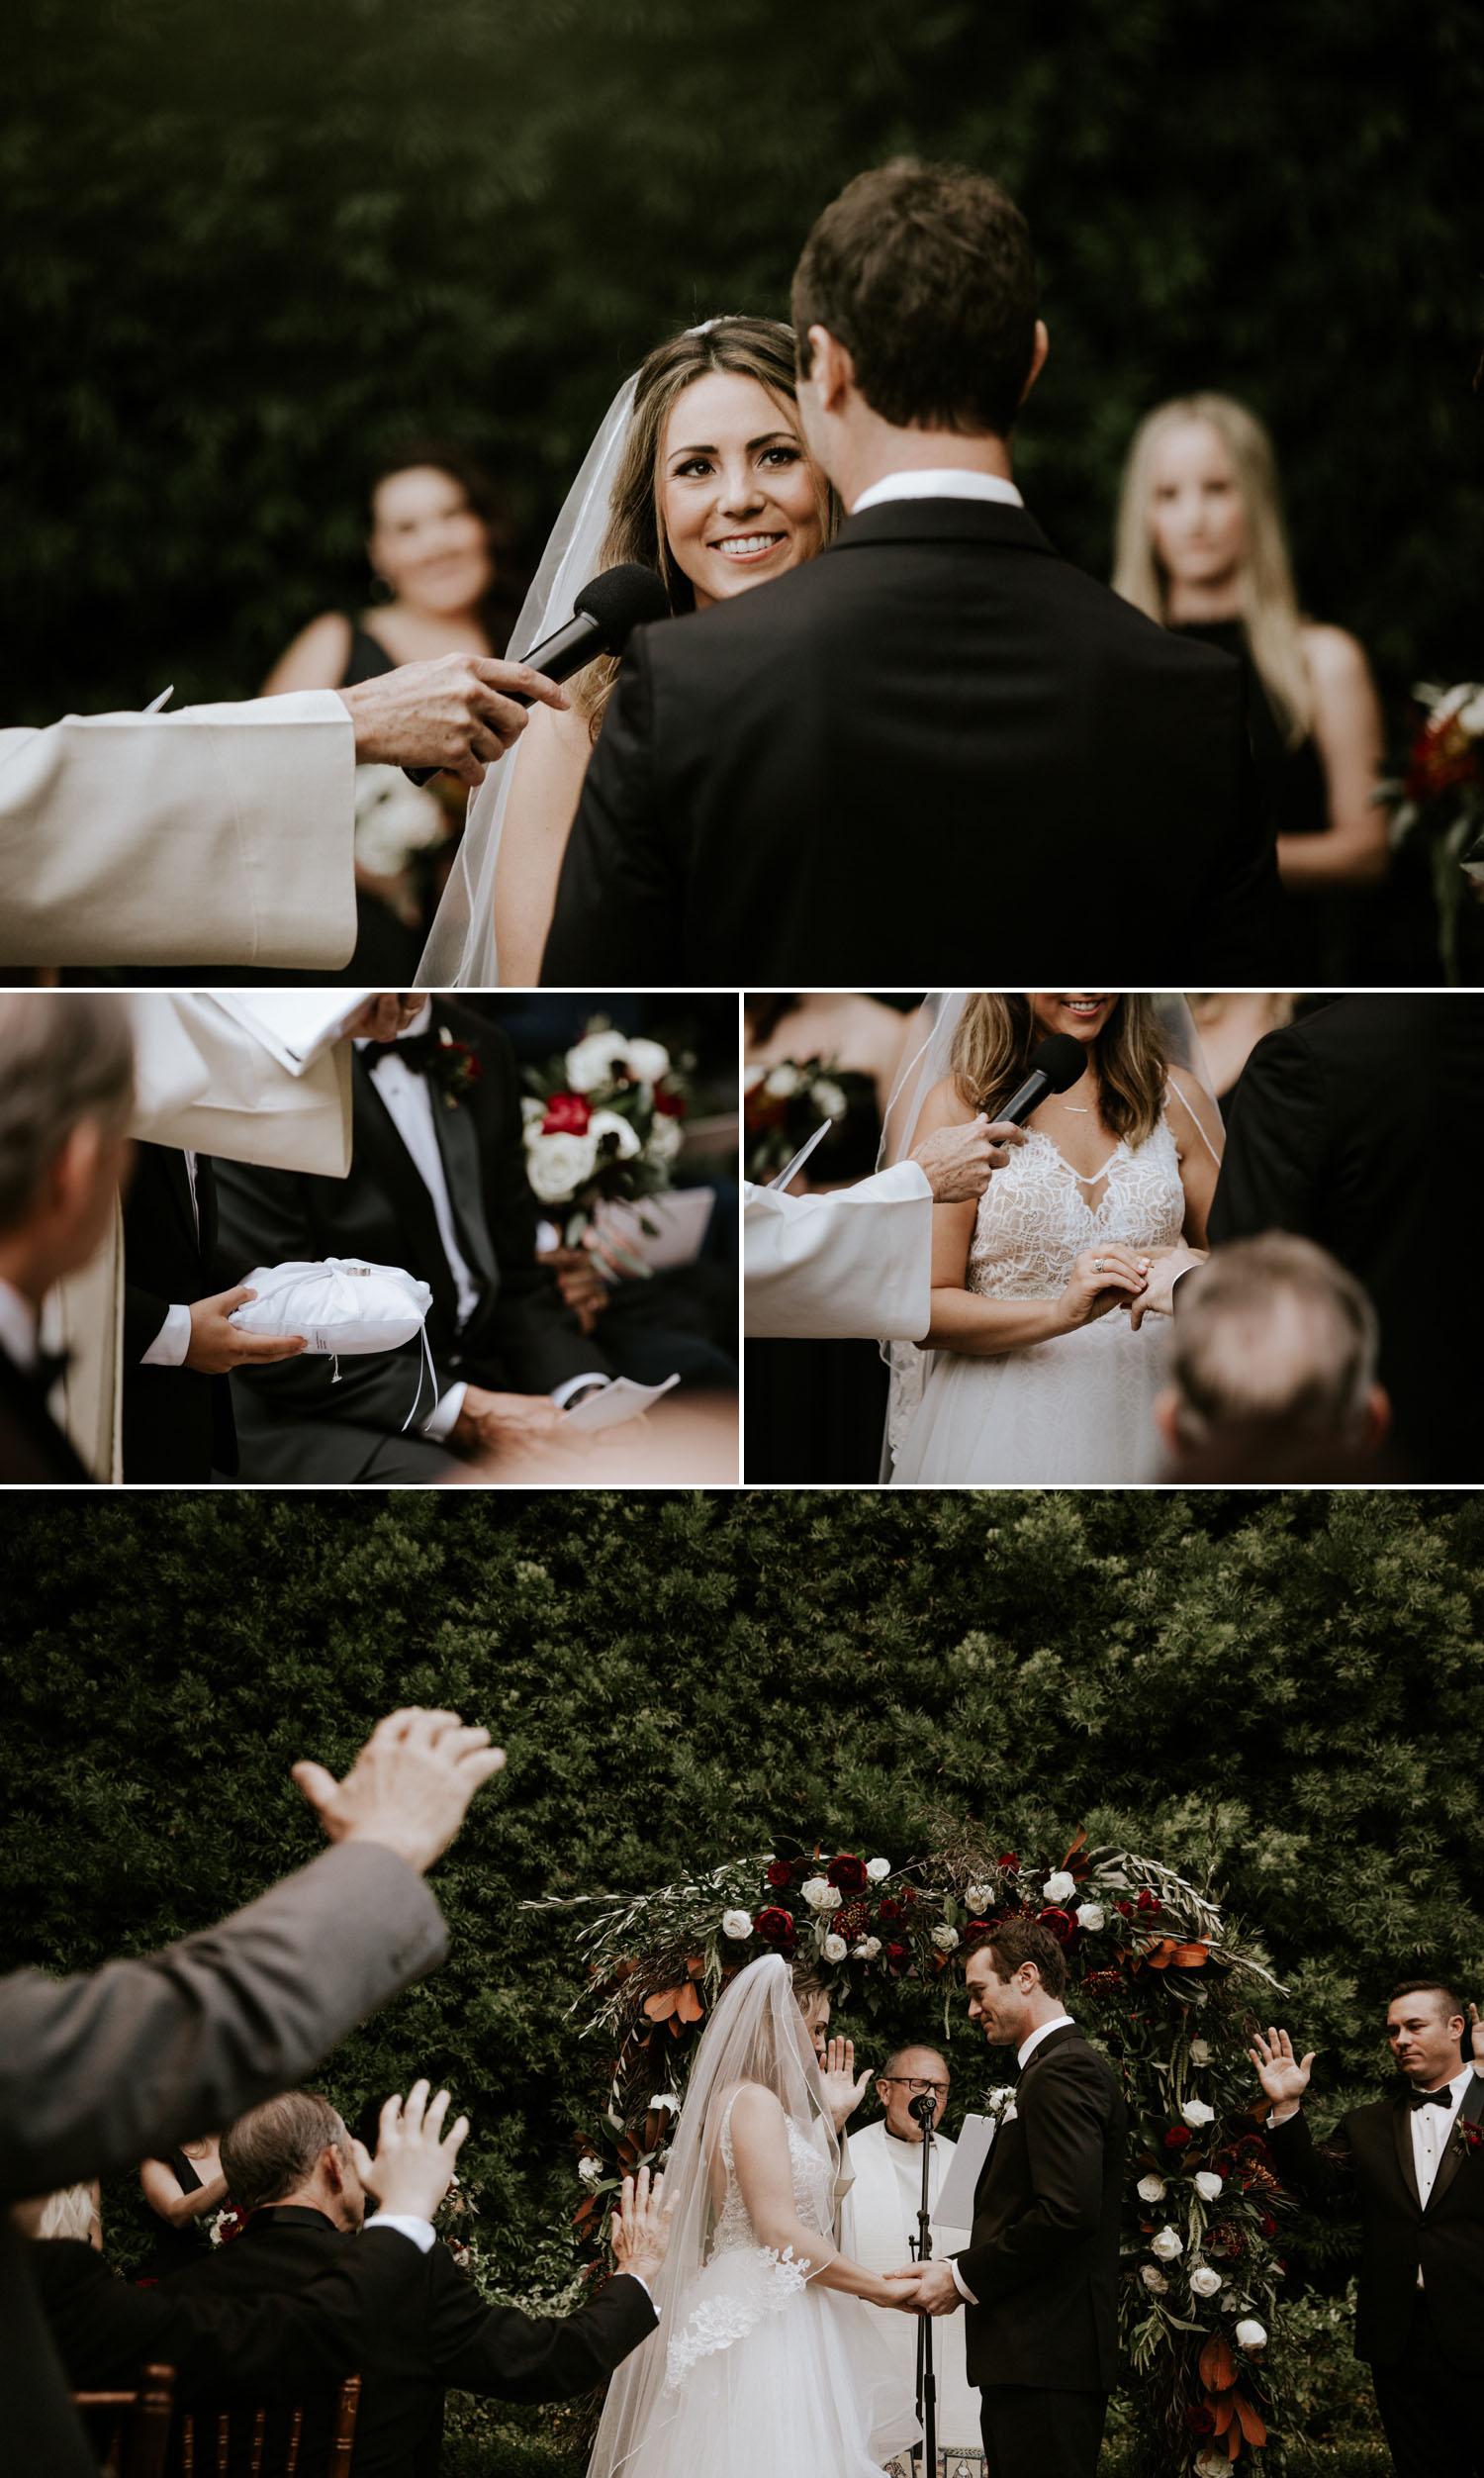 Intimate wedding at Franciscan Gardens in San Juan Capistrano